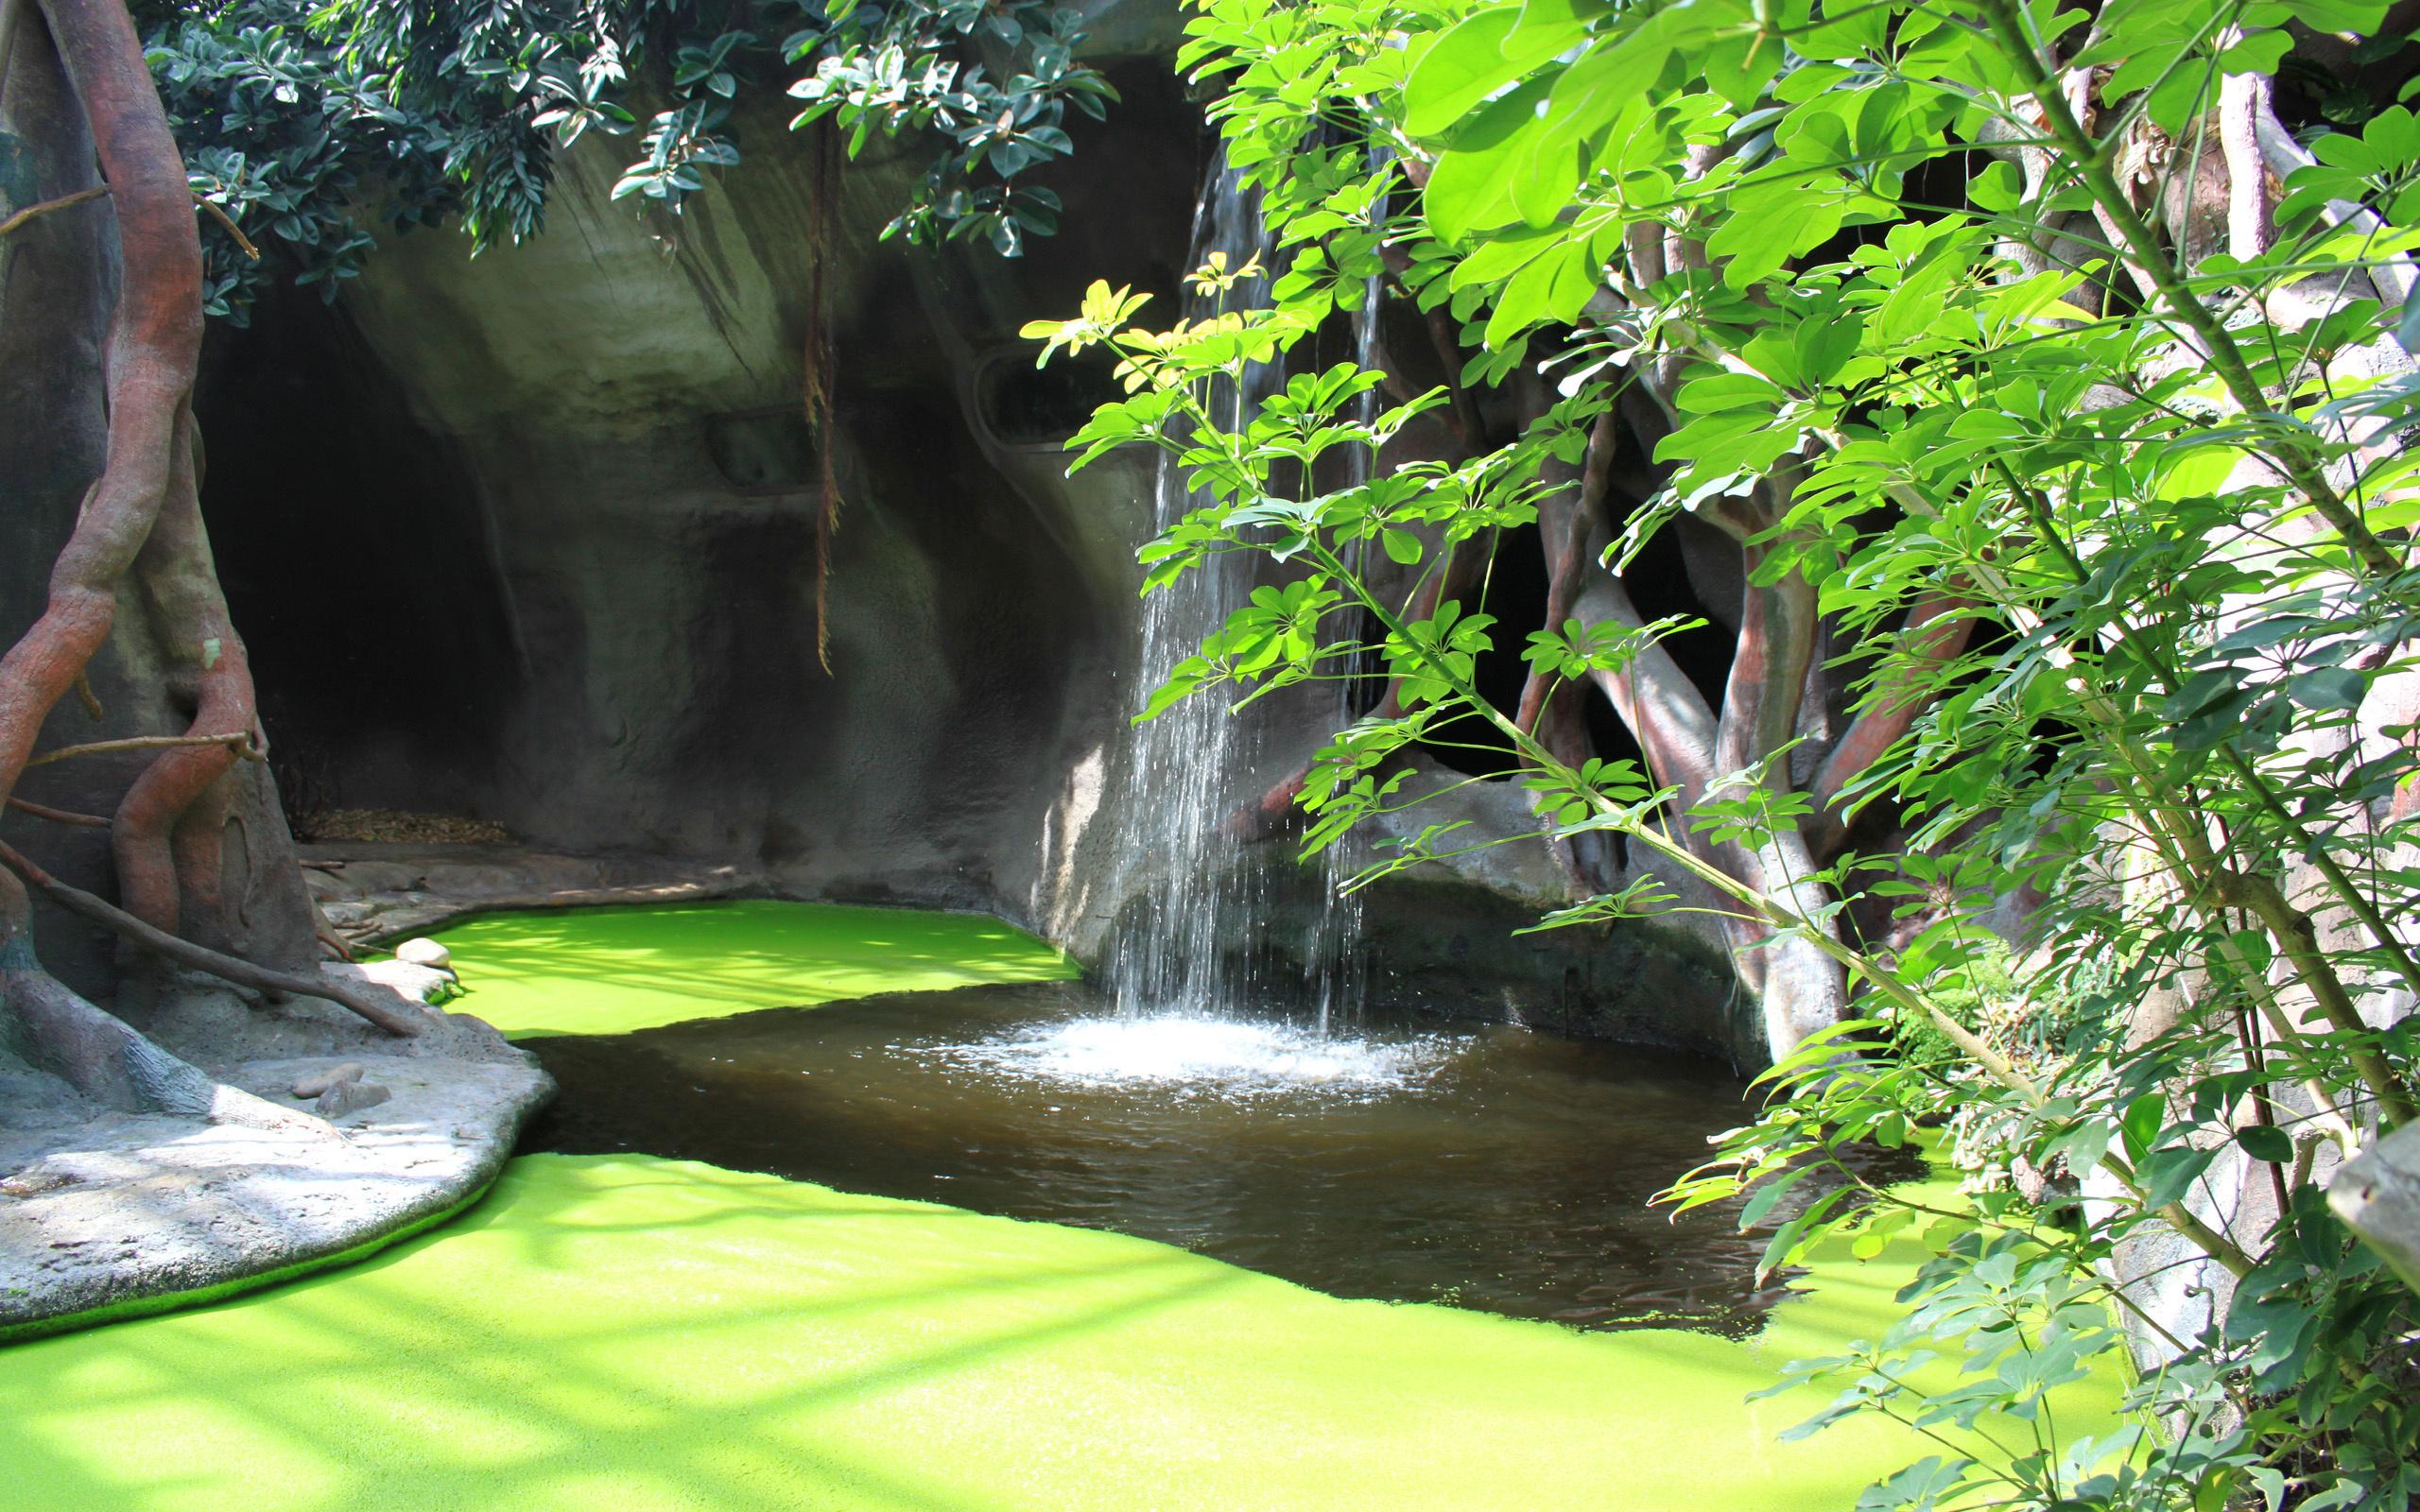 Jardin fonds d 39 cran arri res plan 2560x1600 id 436374 - Fond d ecran jardin anglais ...